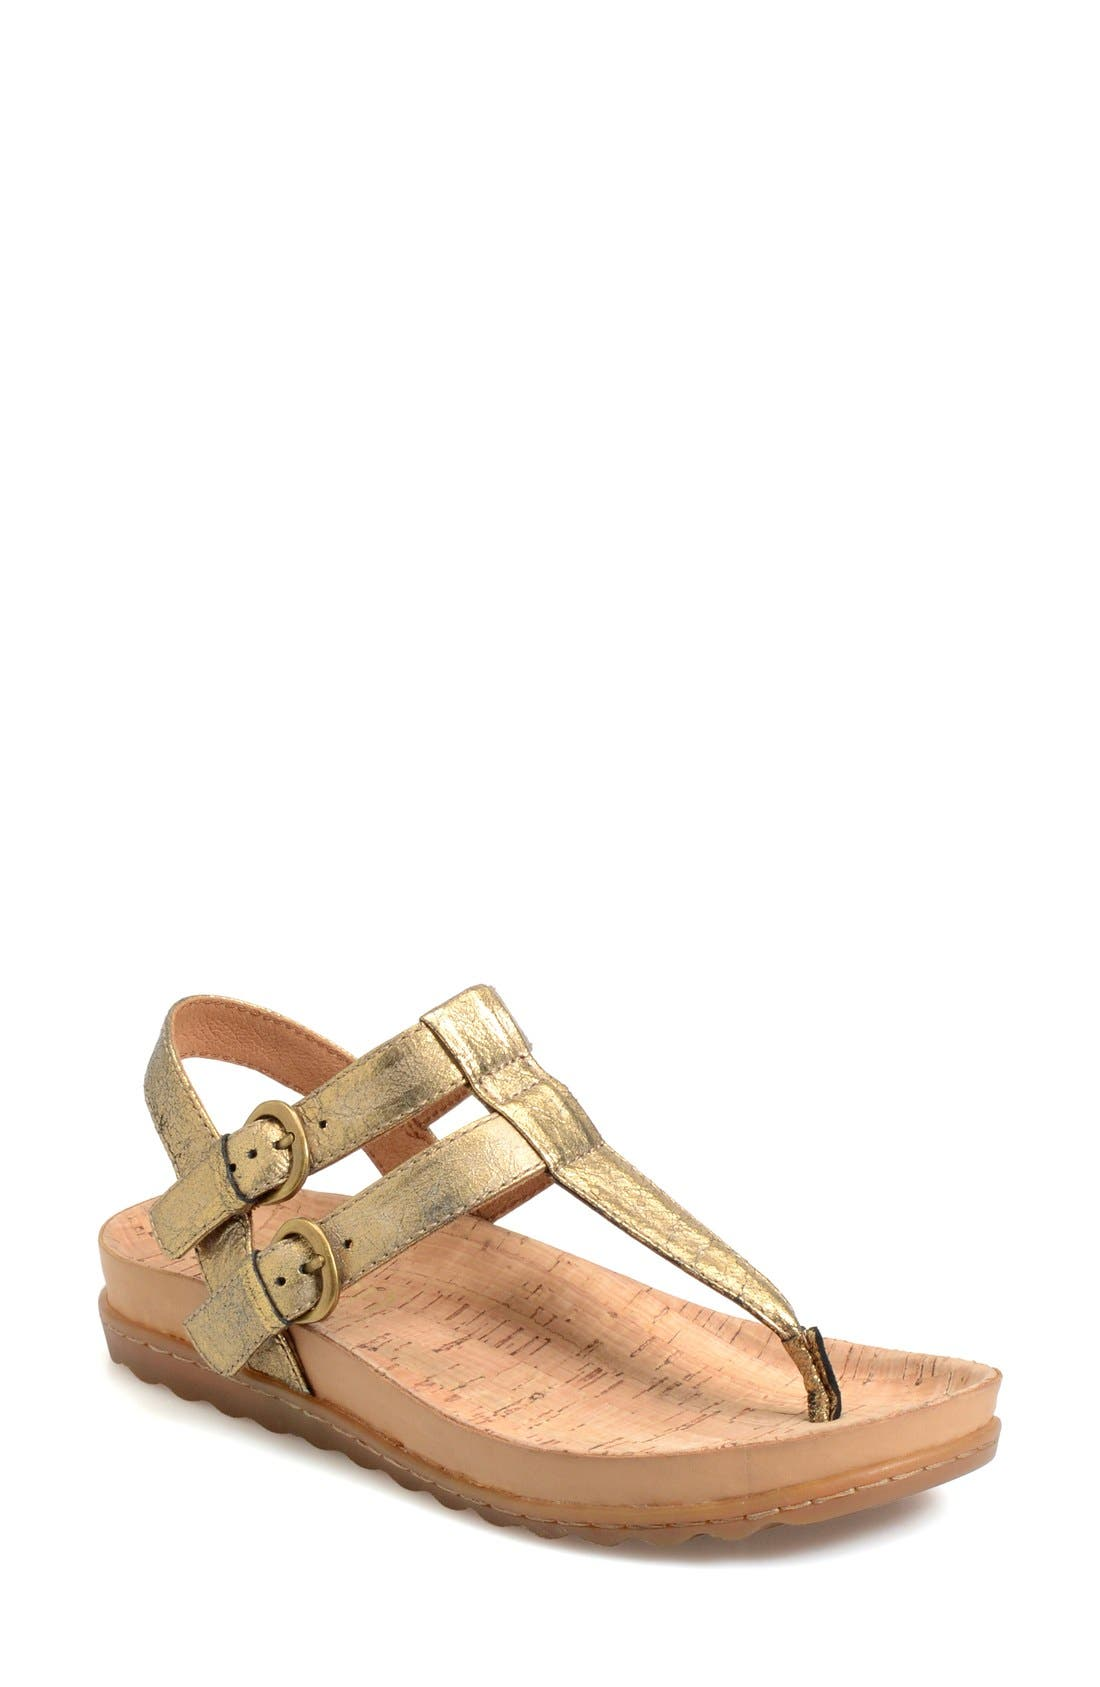 Main Image - Børn 'Reta' Leather Thong Sandal (Women)